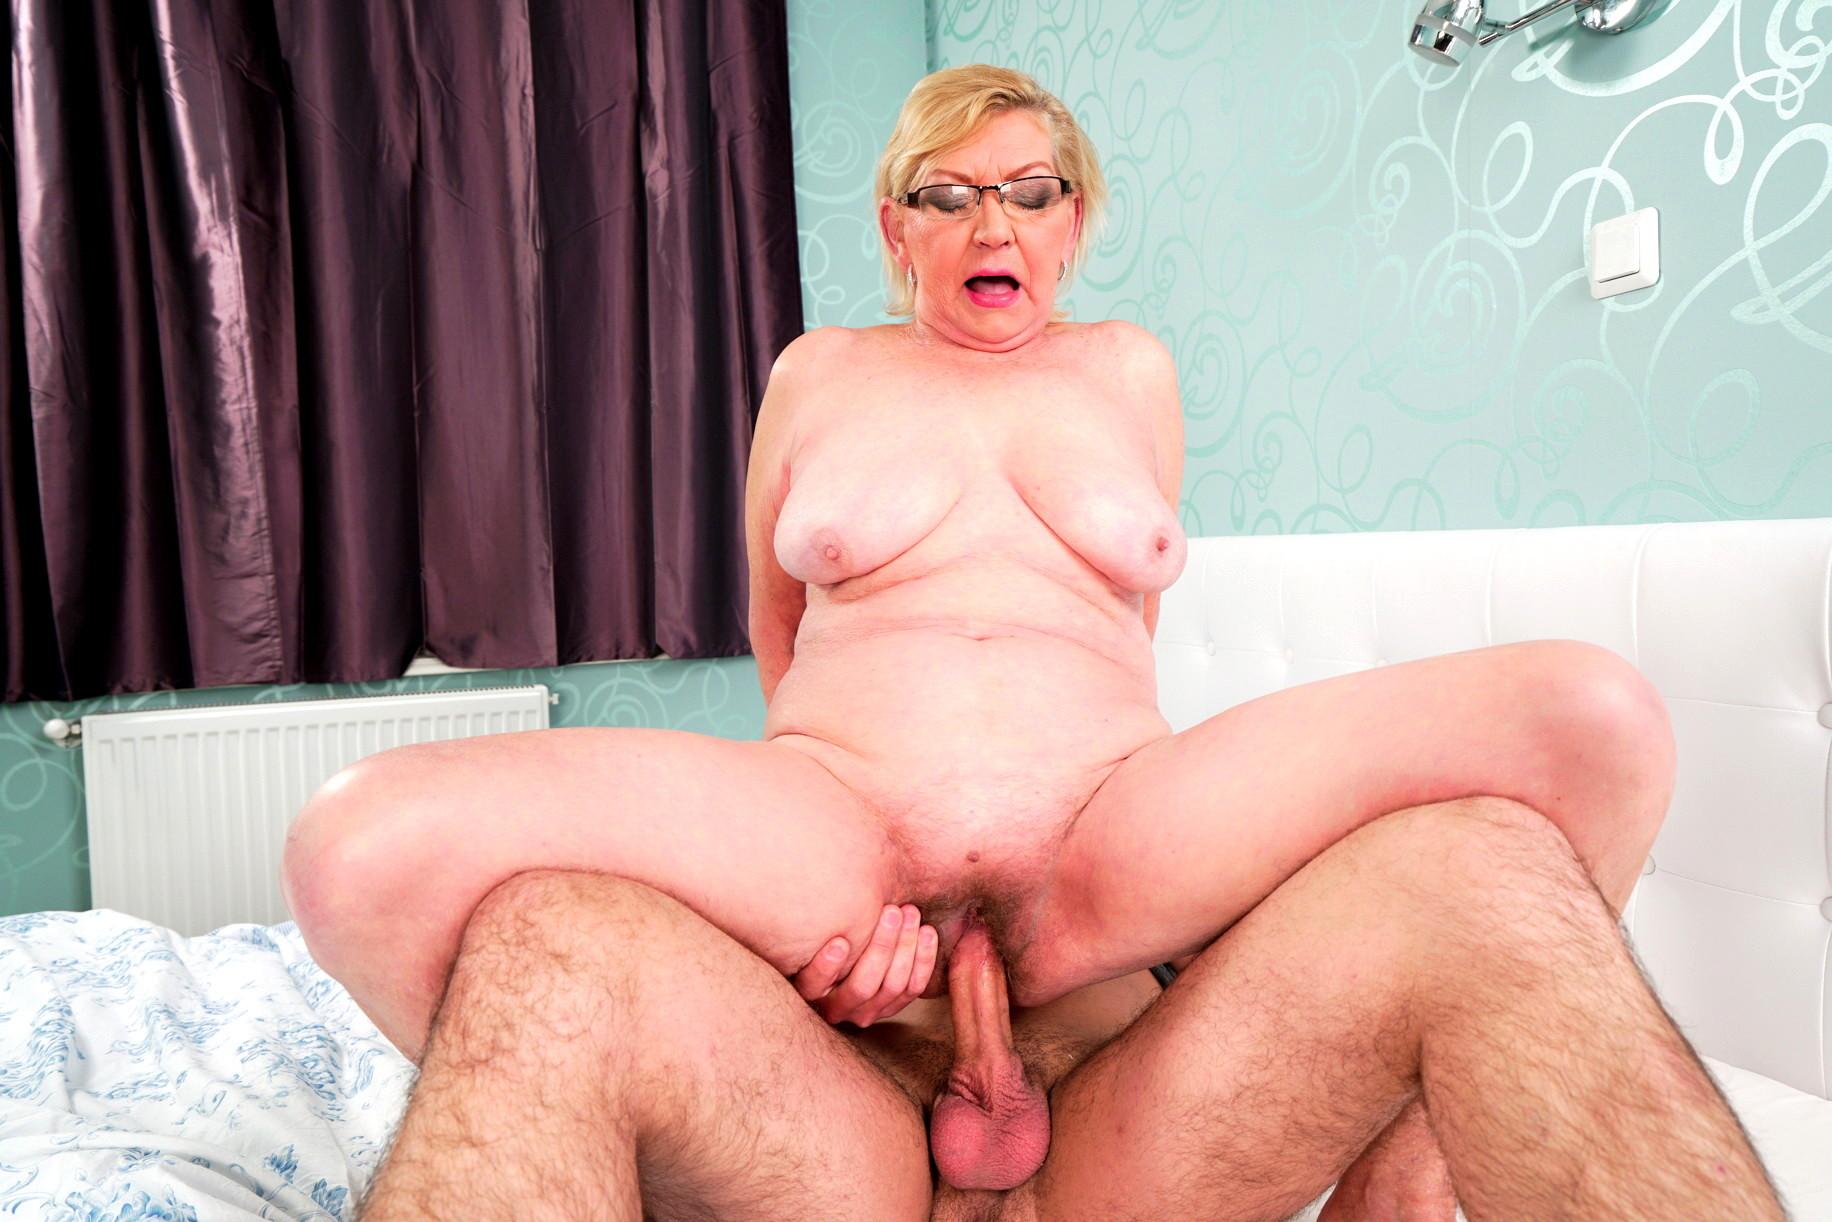 Granny sex, mature porn links, oma sex